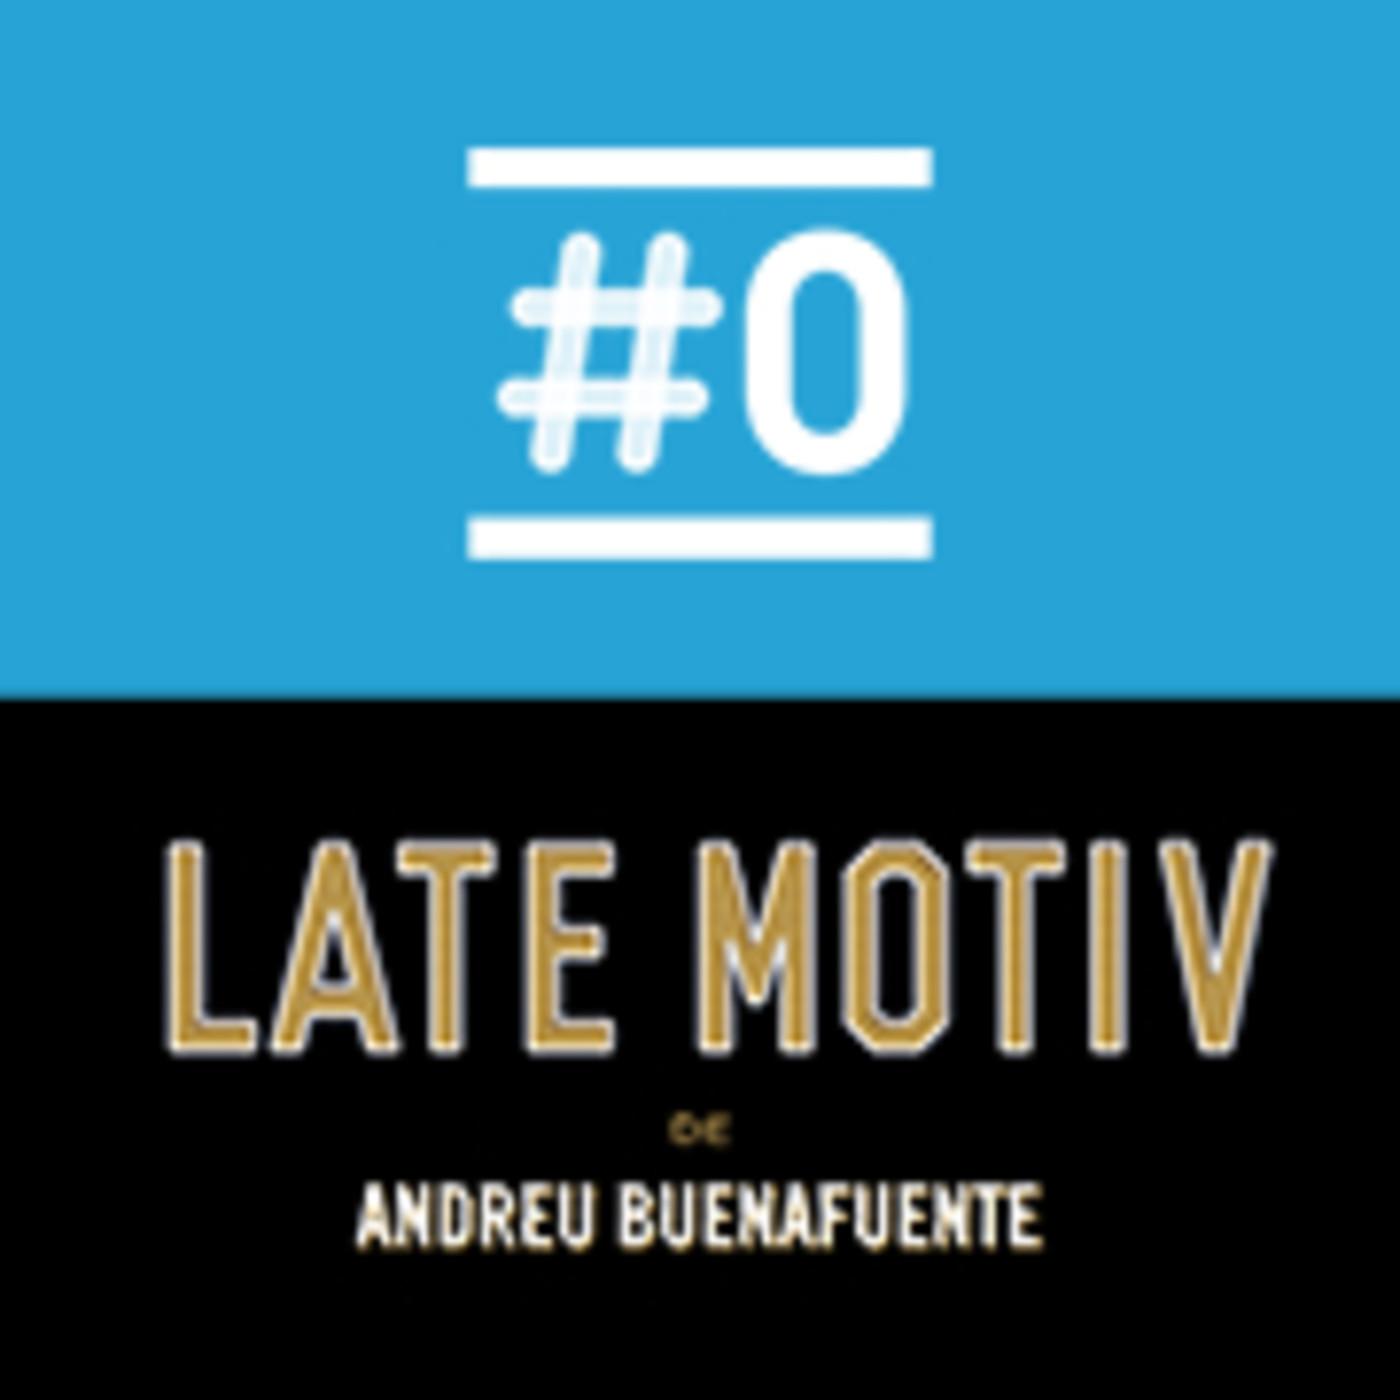 LATE MOTIV 578 - Programa completo